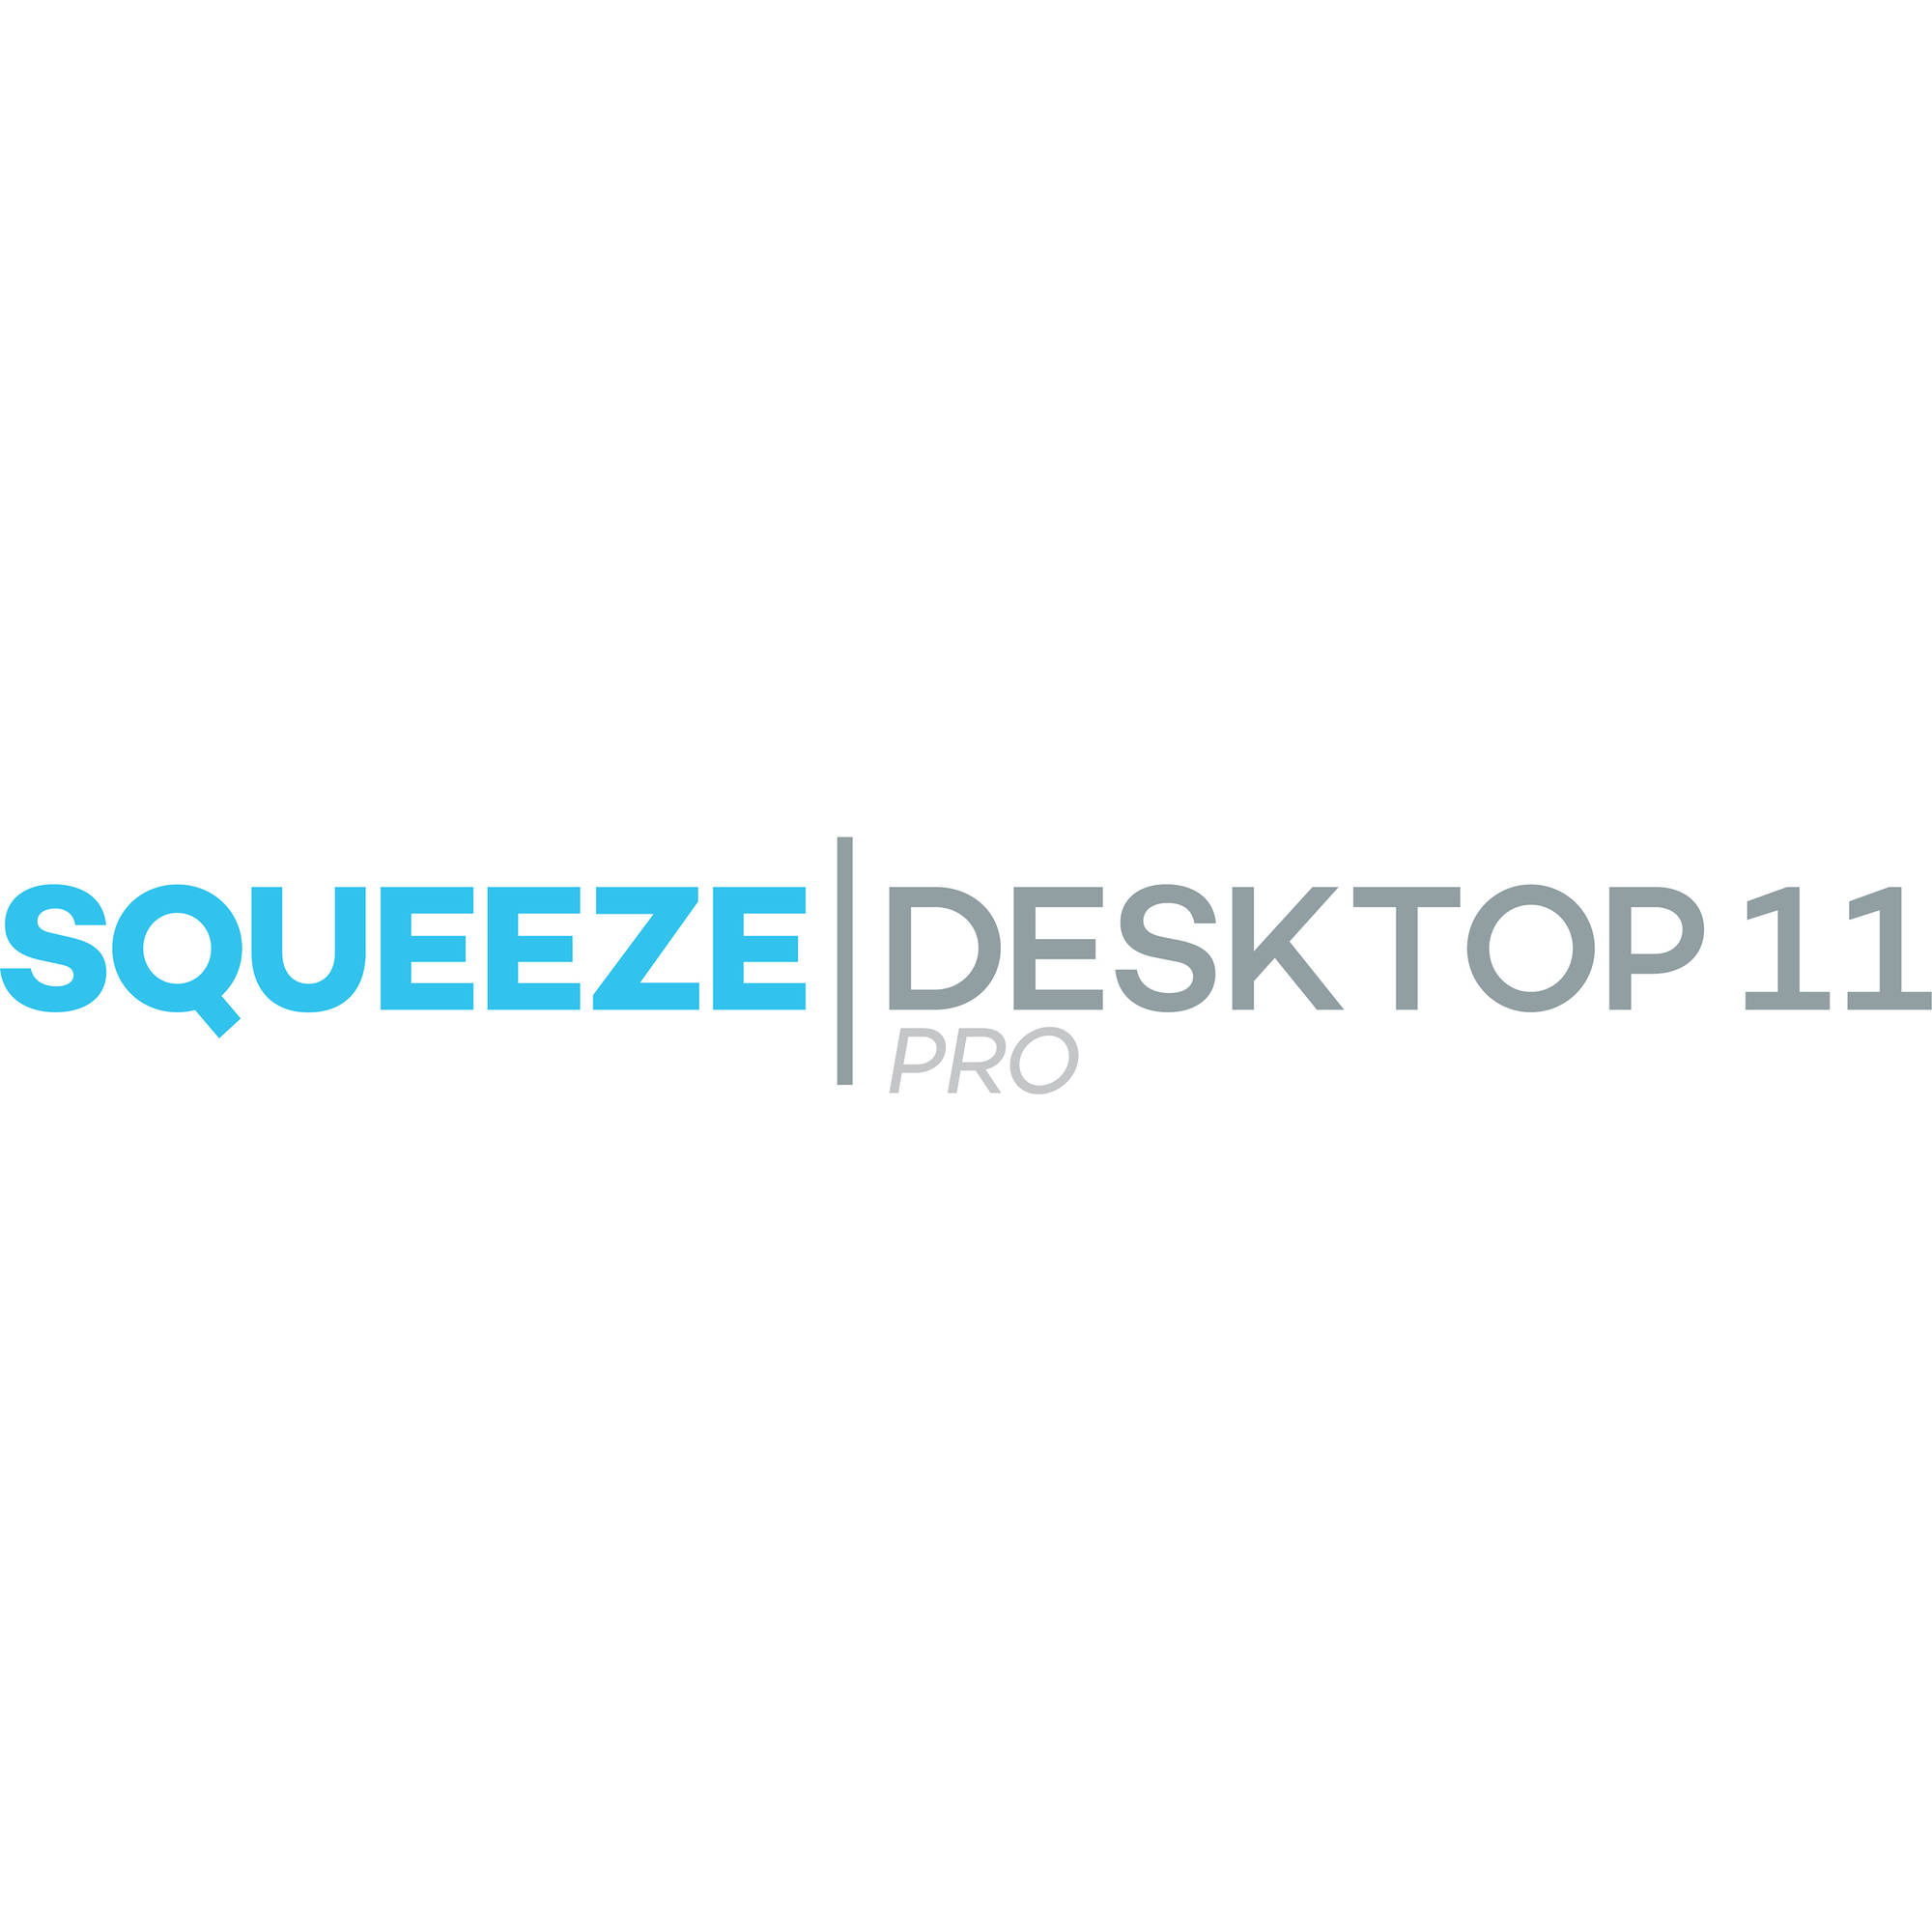 Sorenson Media Squeeze Desktop 11 Pro - Edu/Gov't/Non-Profit (Upgrade from  Squeeze Desktop 11 Standard, Hard Copy)